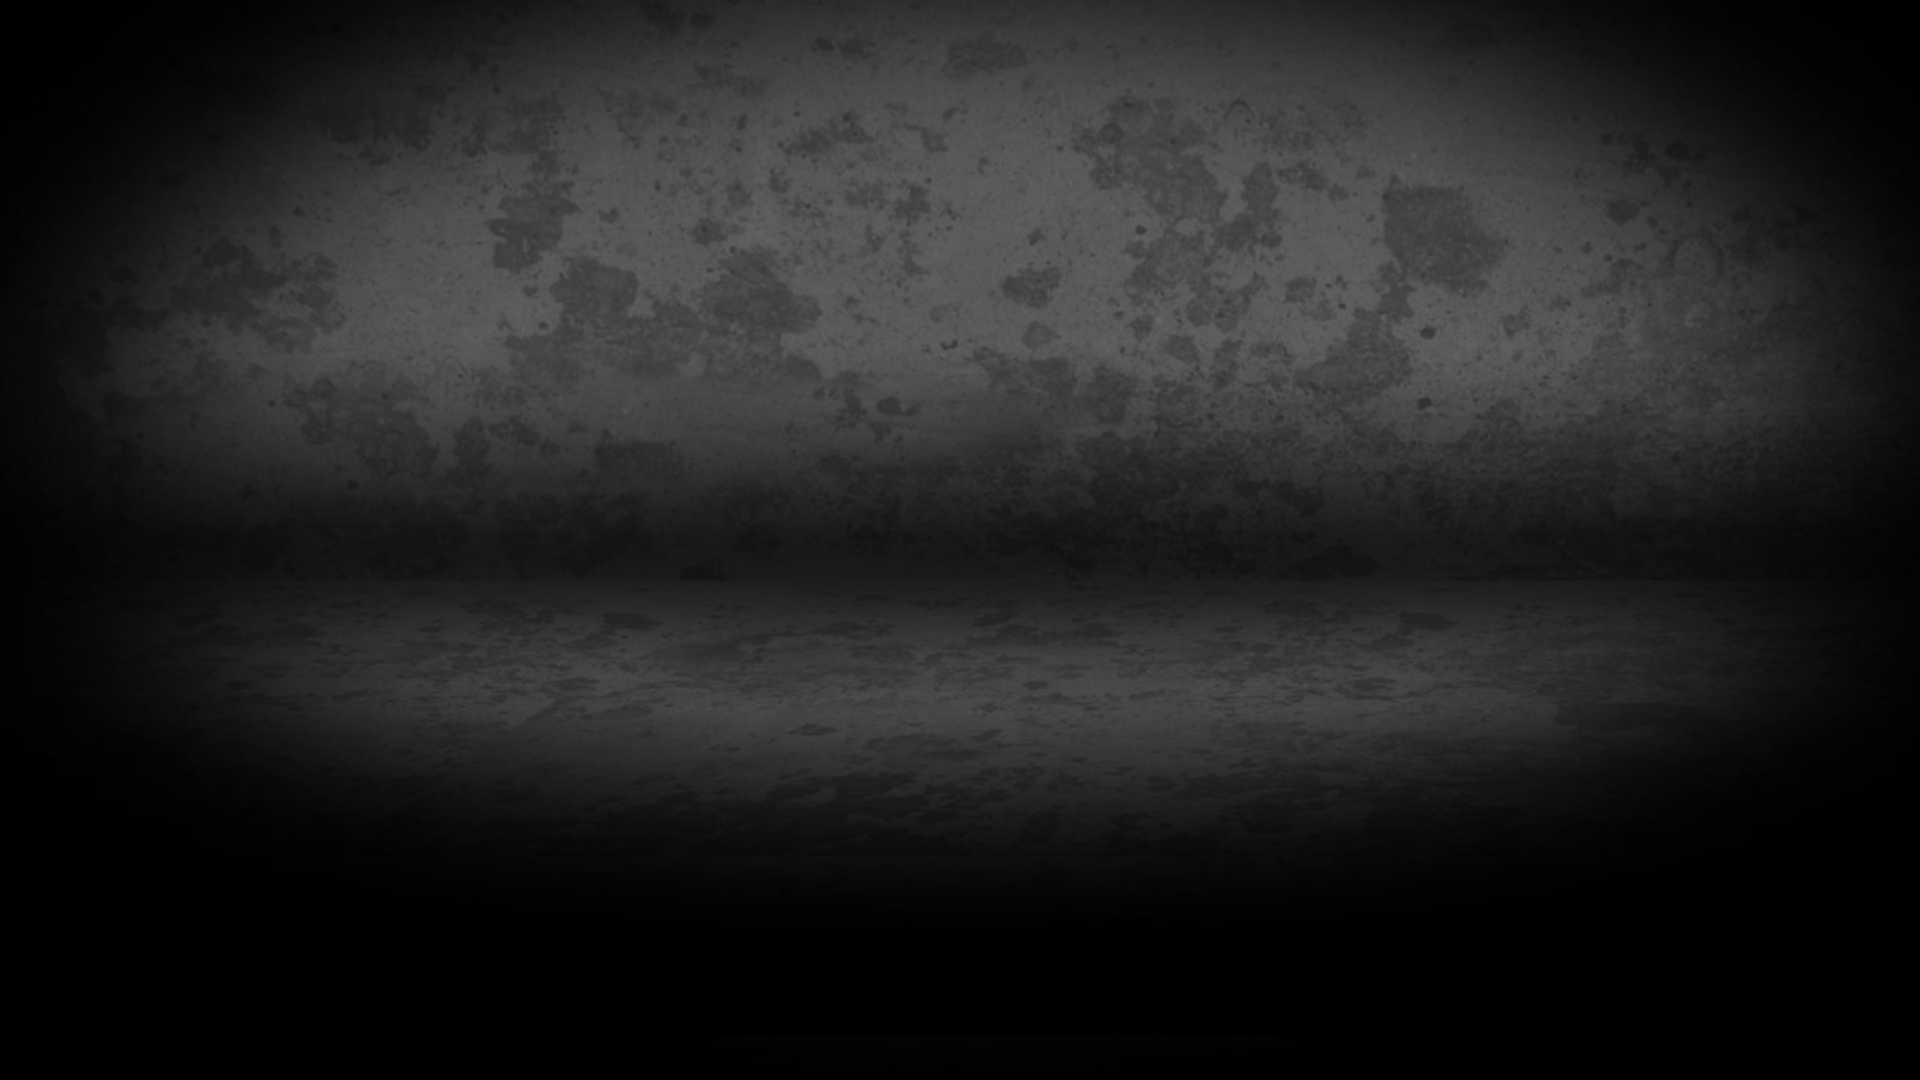 Xbmc Wallpapers 1080p 1920x1080